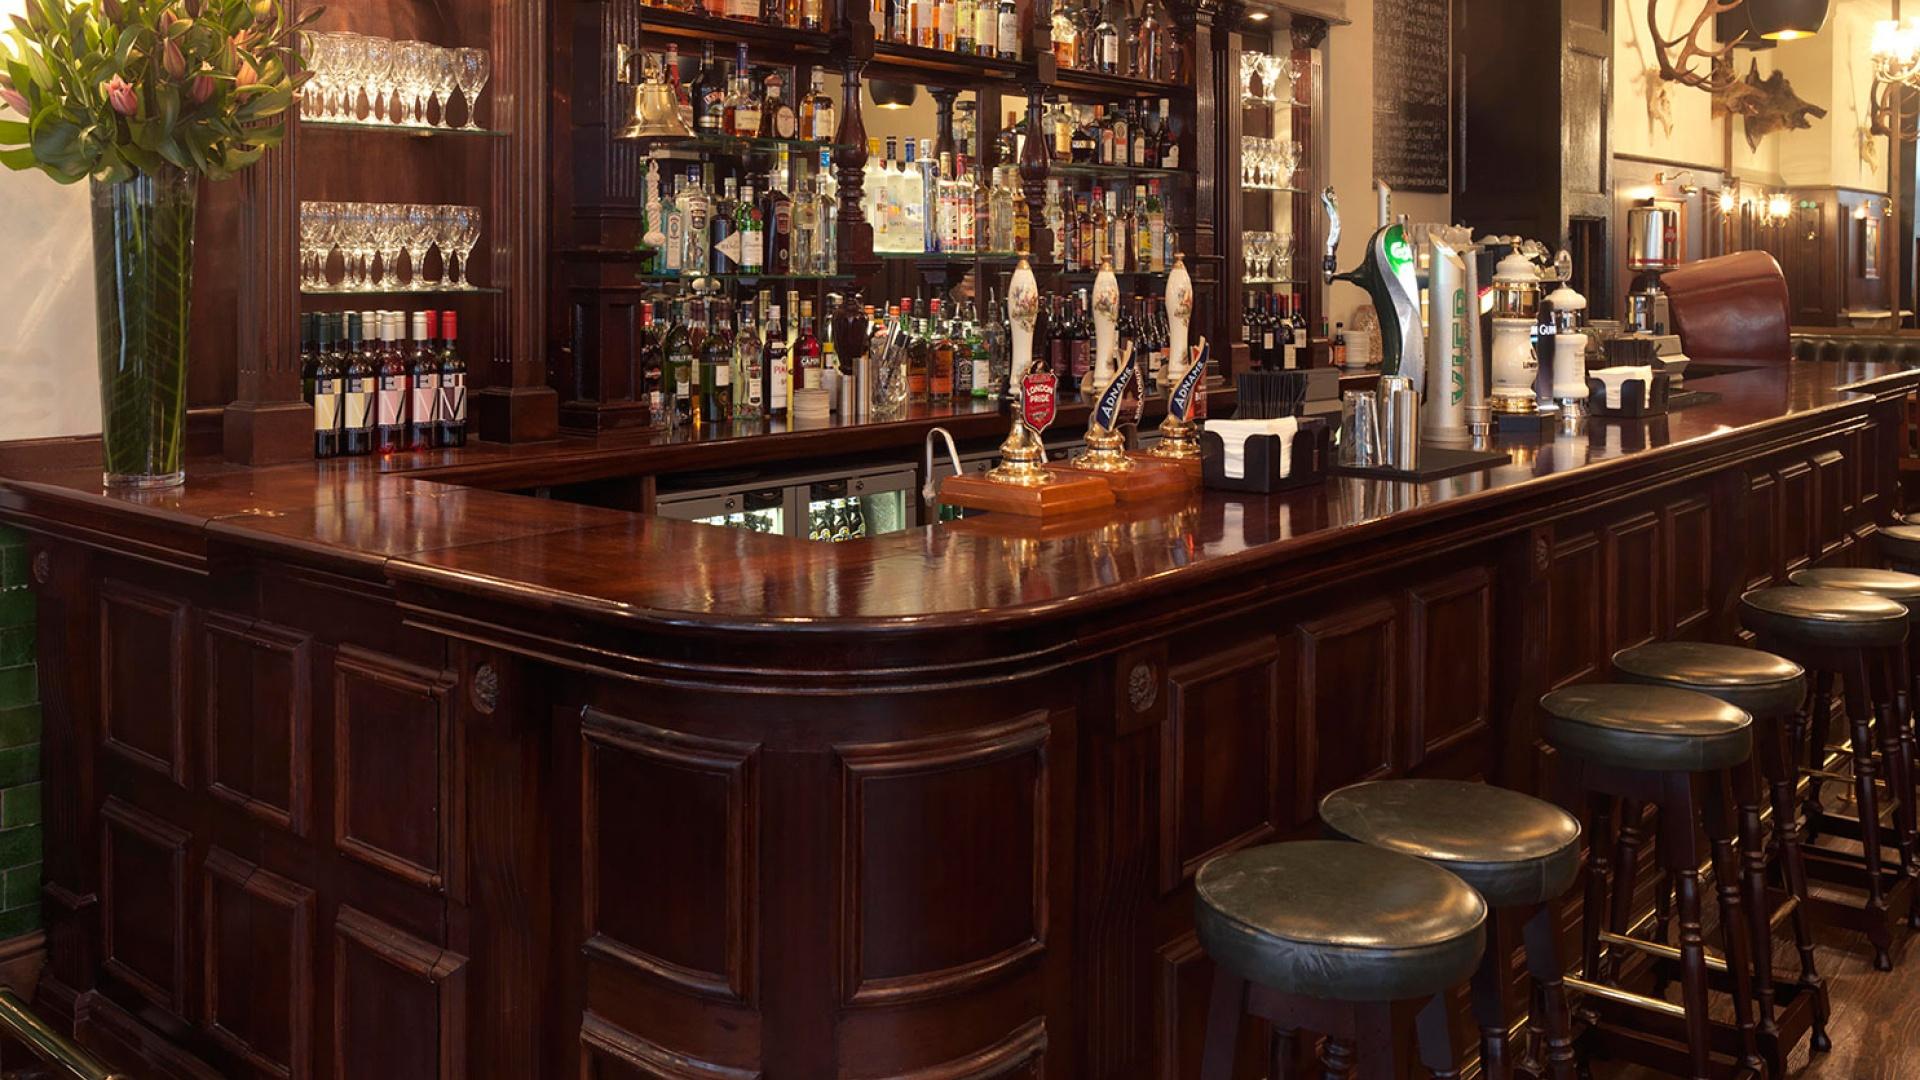 Hat & Tun pub